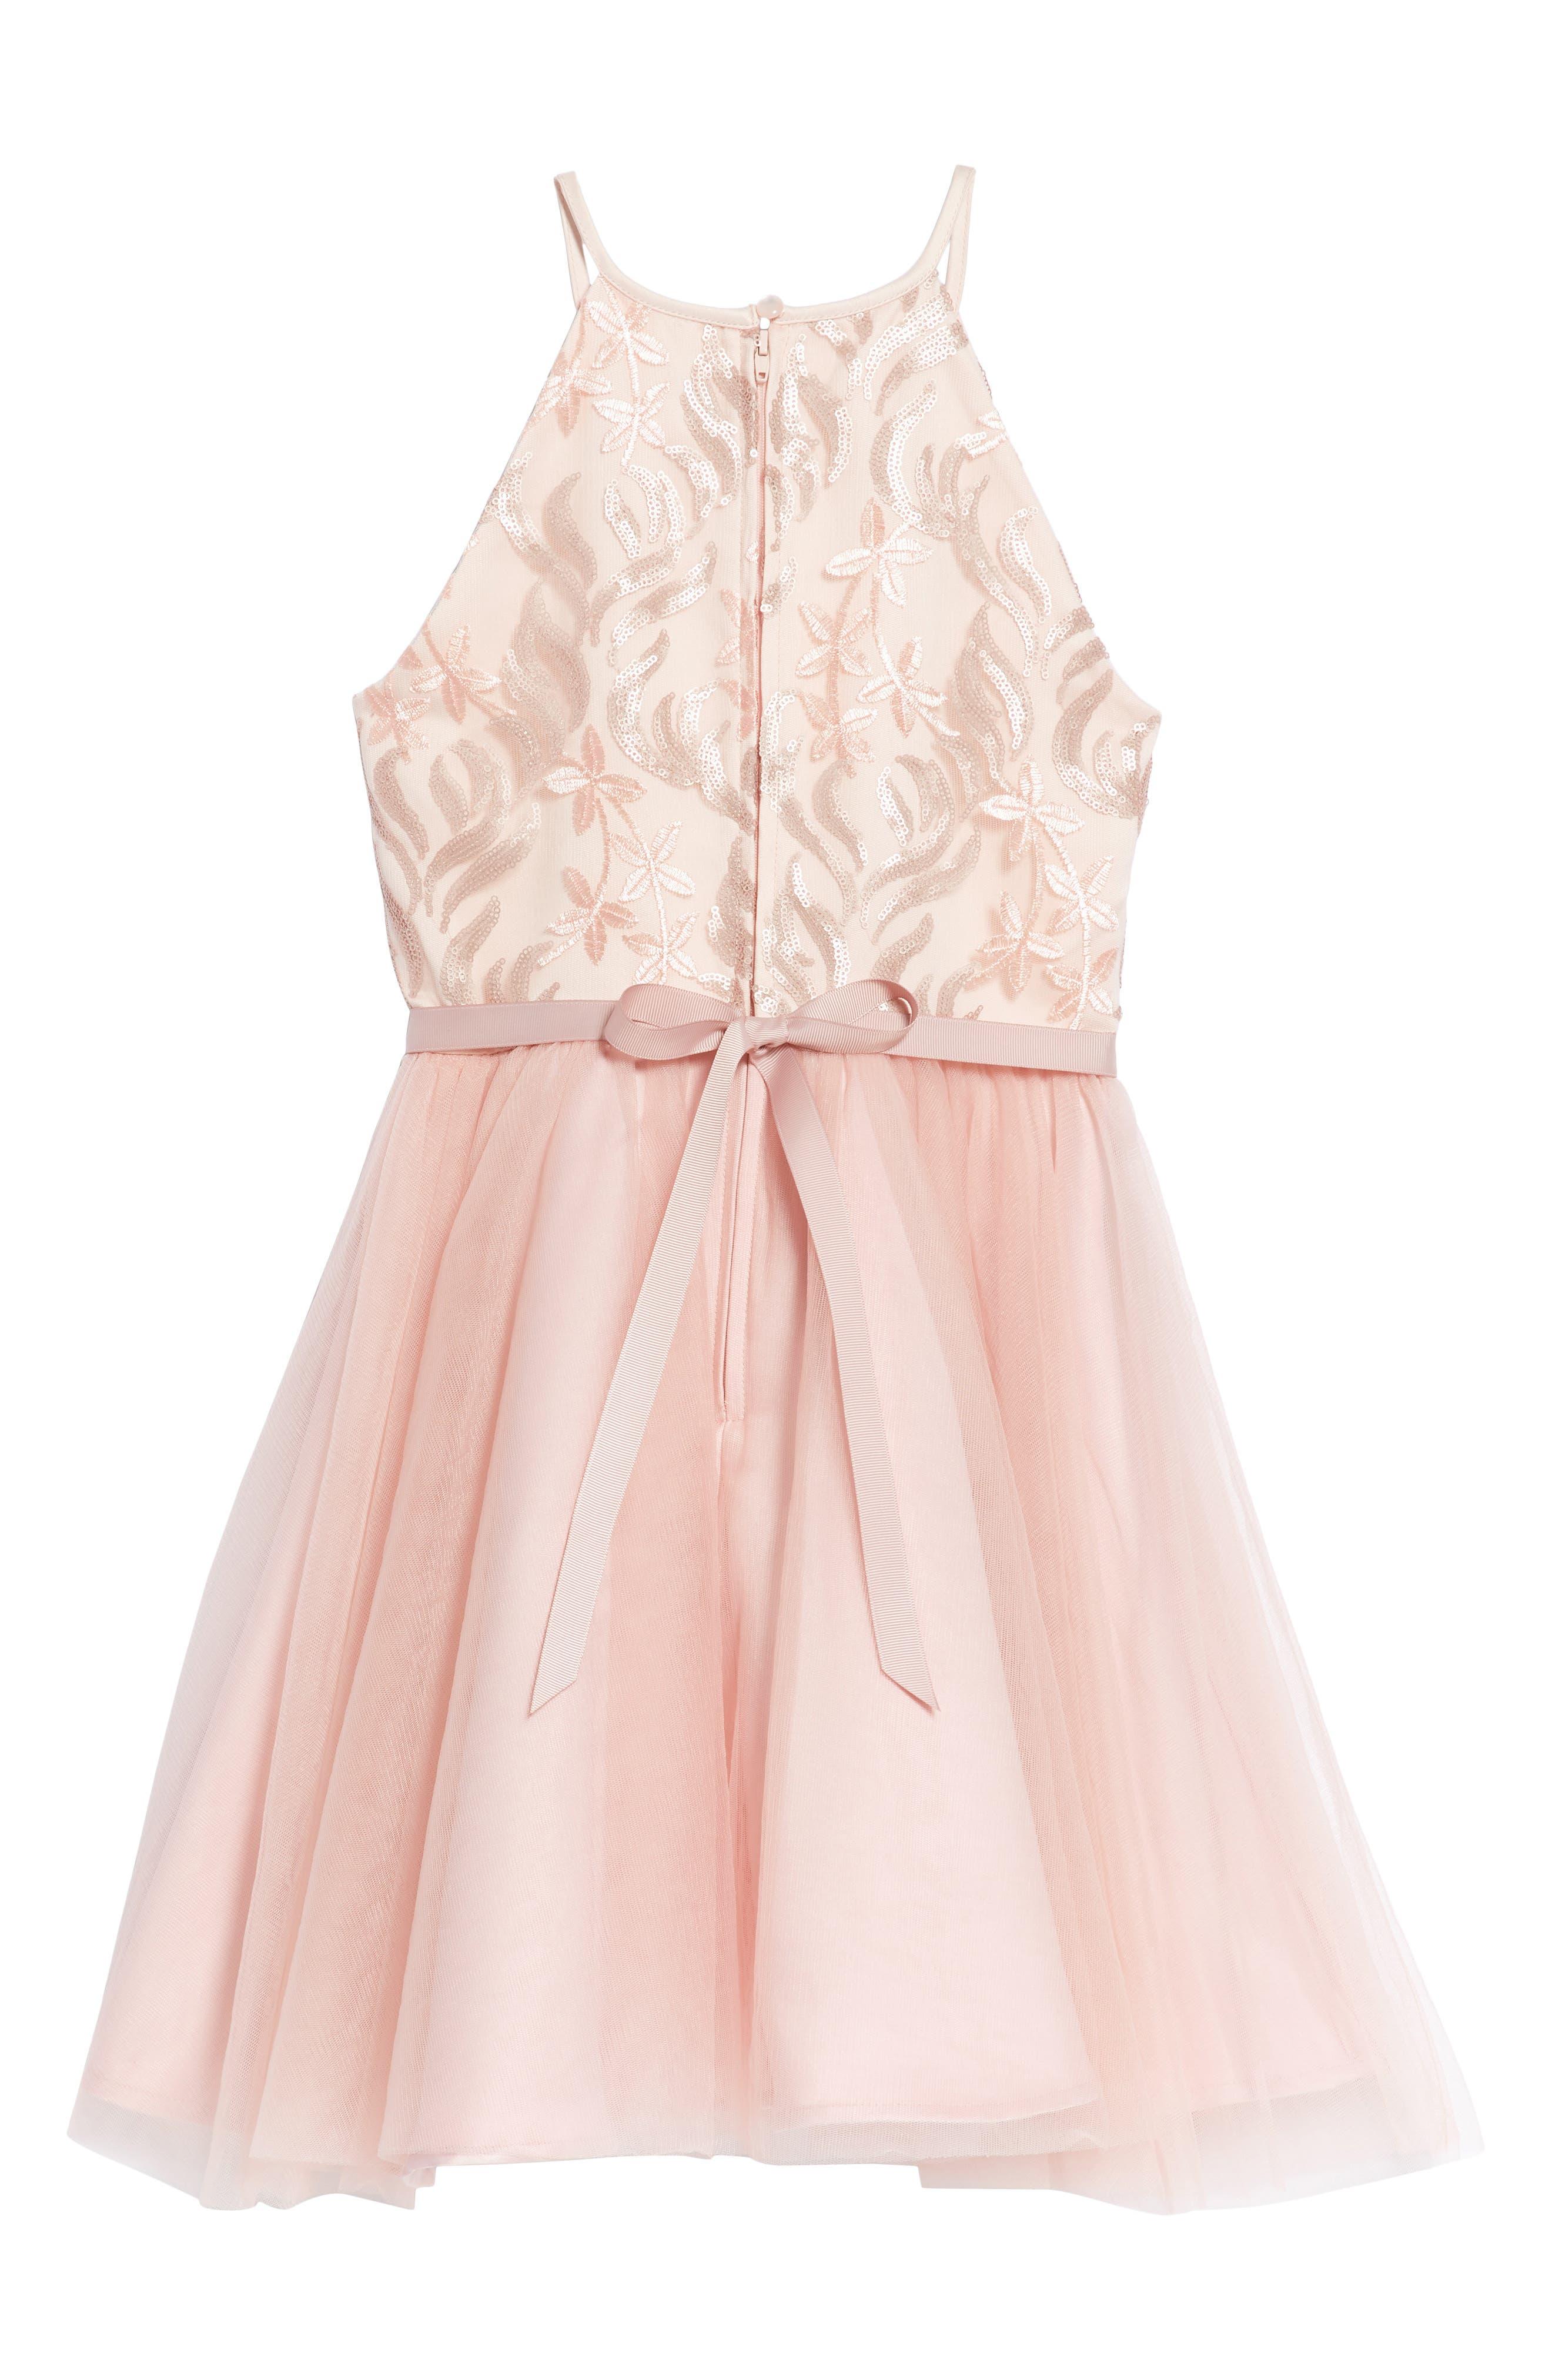 Sequin Tutu Dress,                             Alternate thumbnail 2, color,                             685